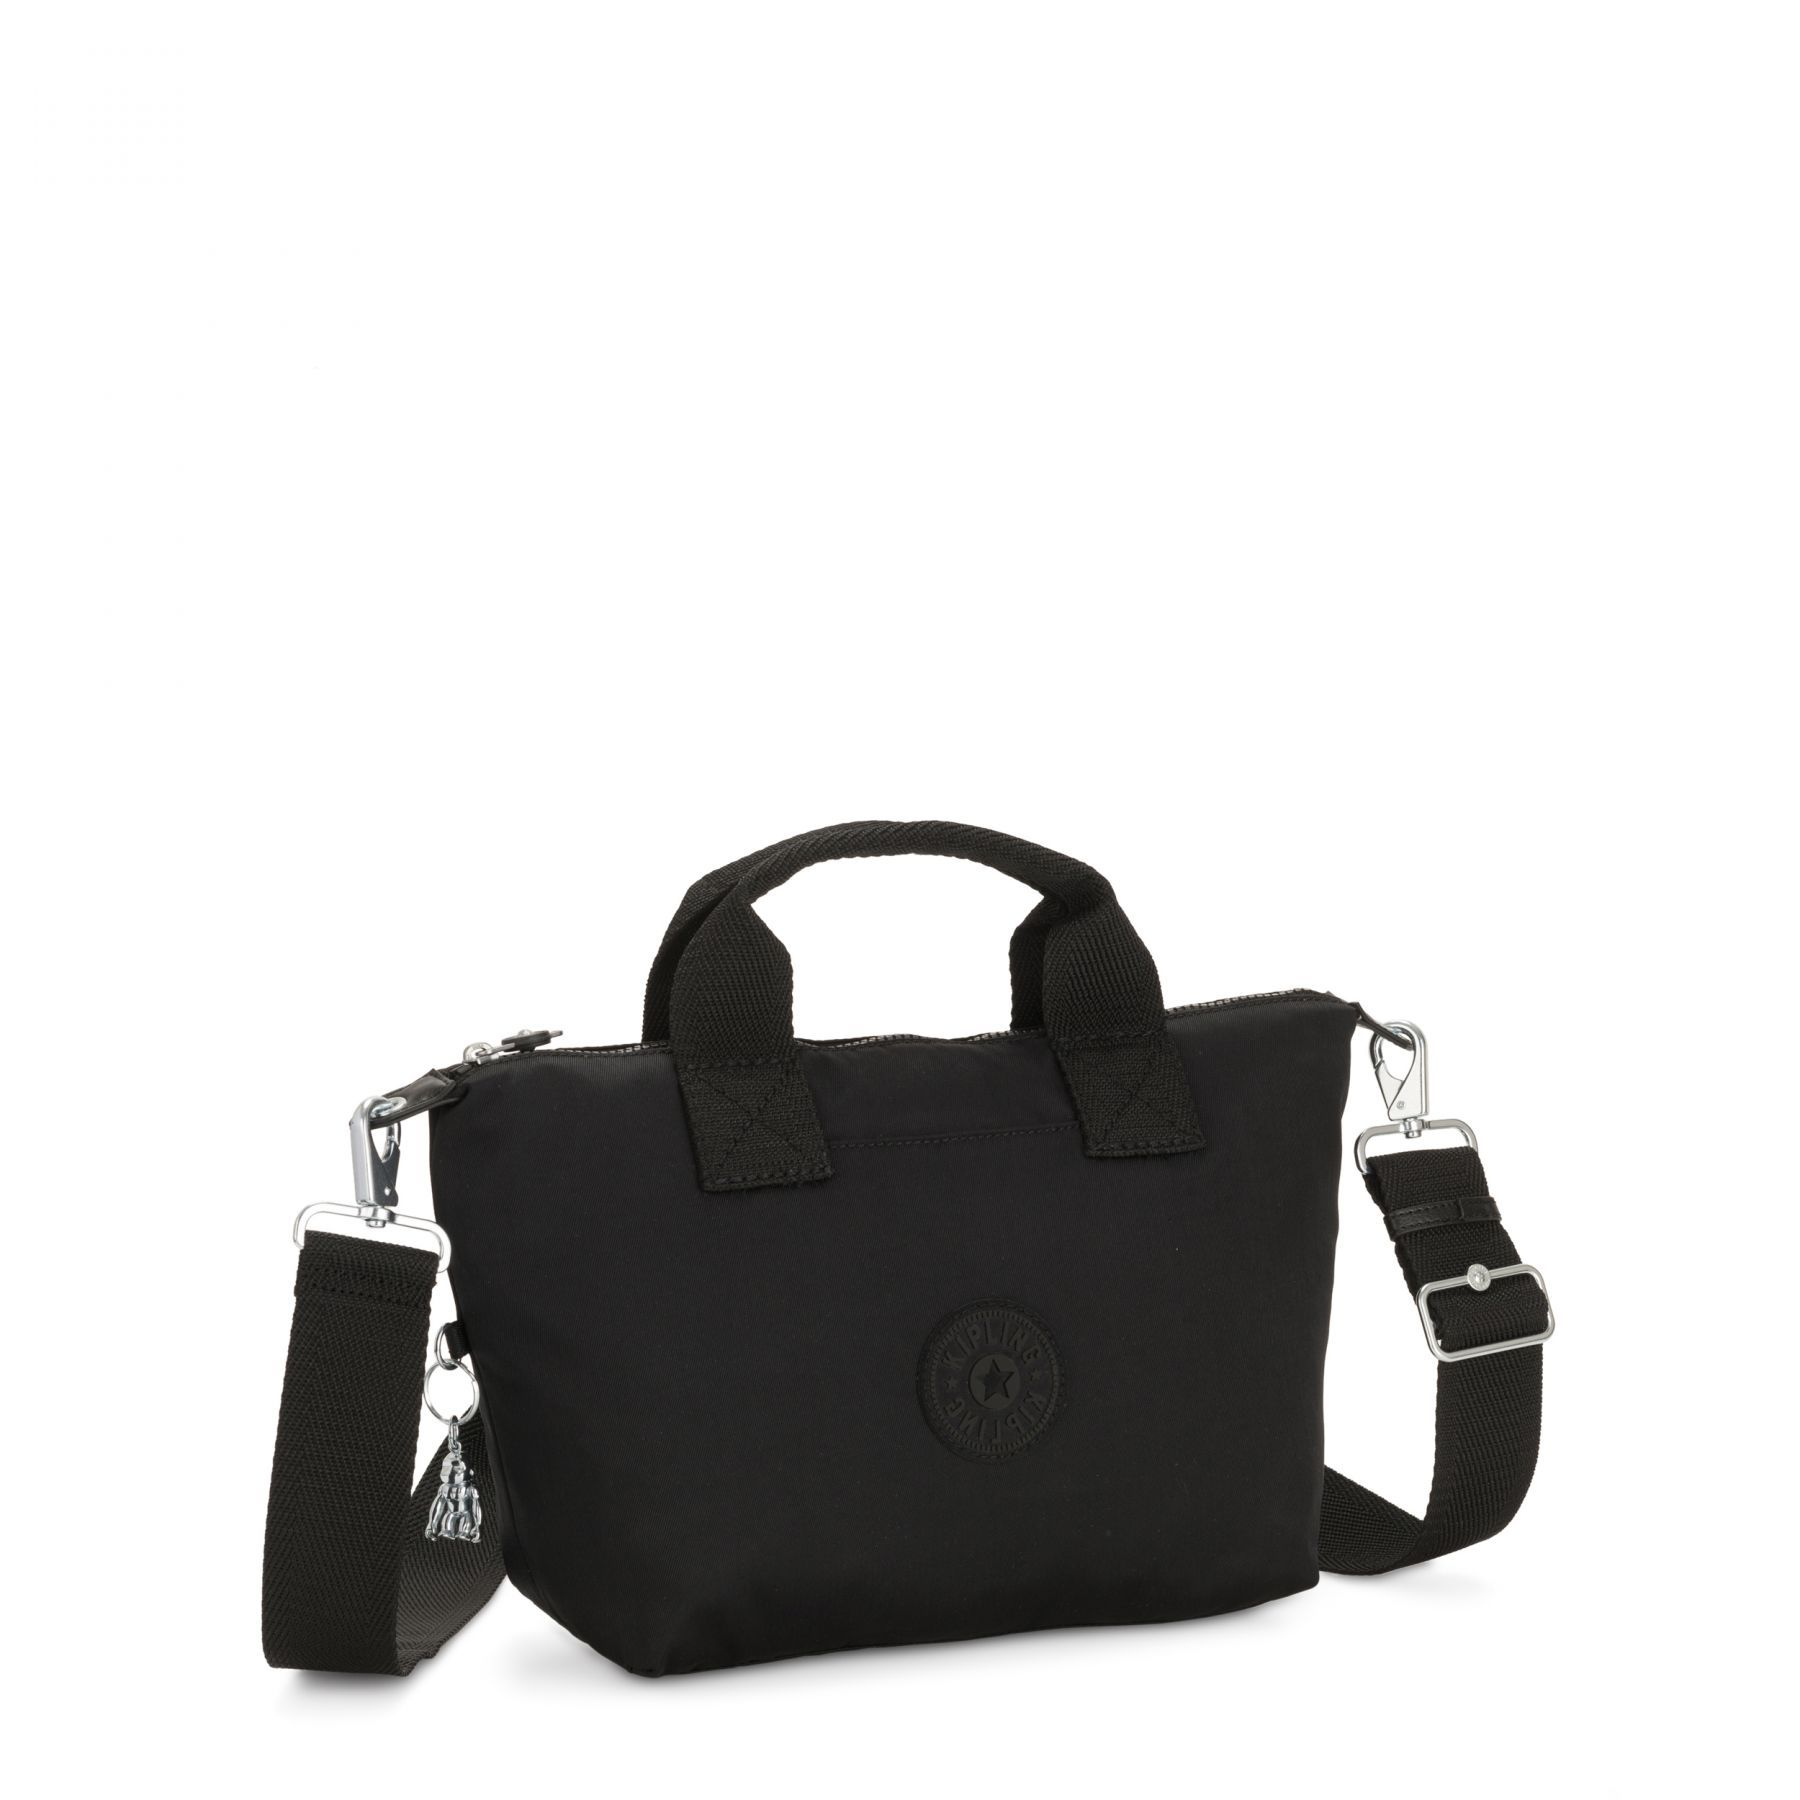 Bolsa Pequena Kala Kipling Rich Black